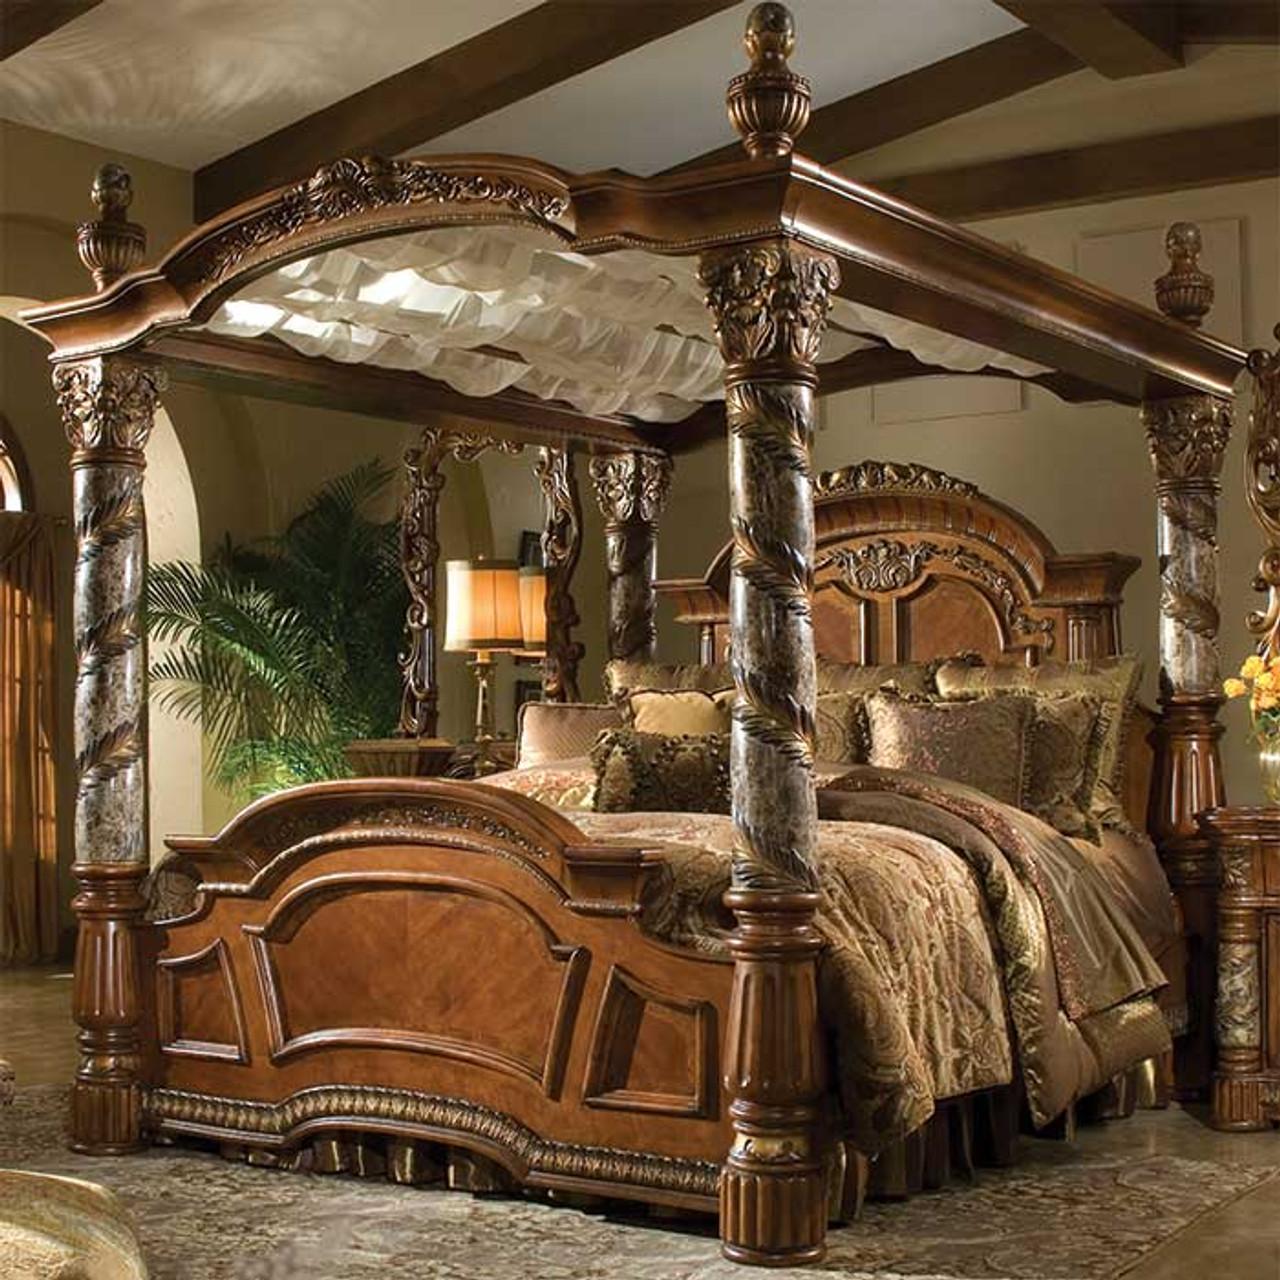 Renaissance King Canopy Bed Magnolia Hall